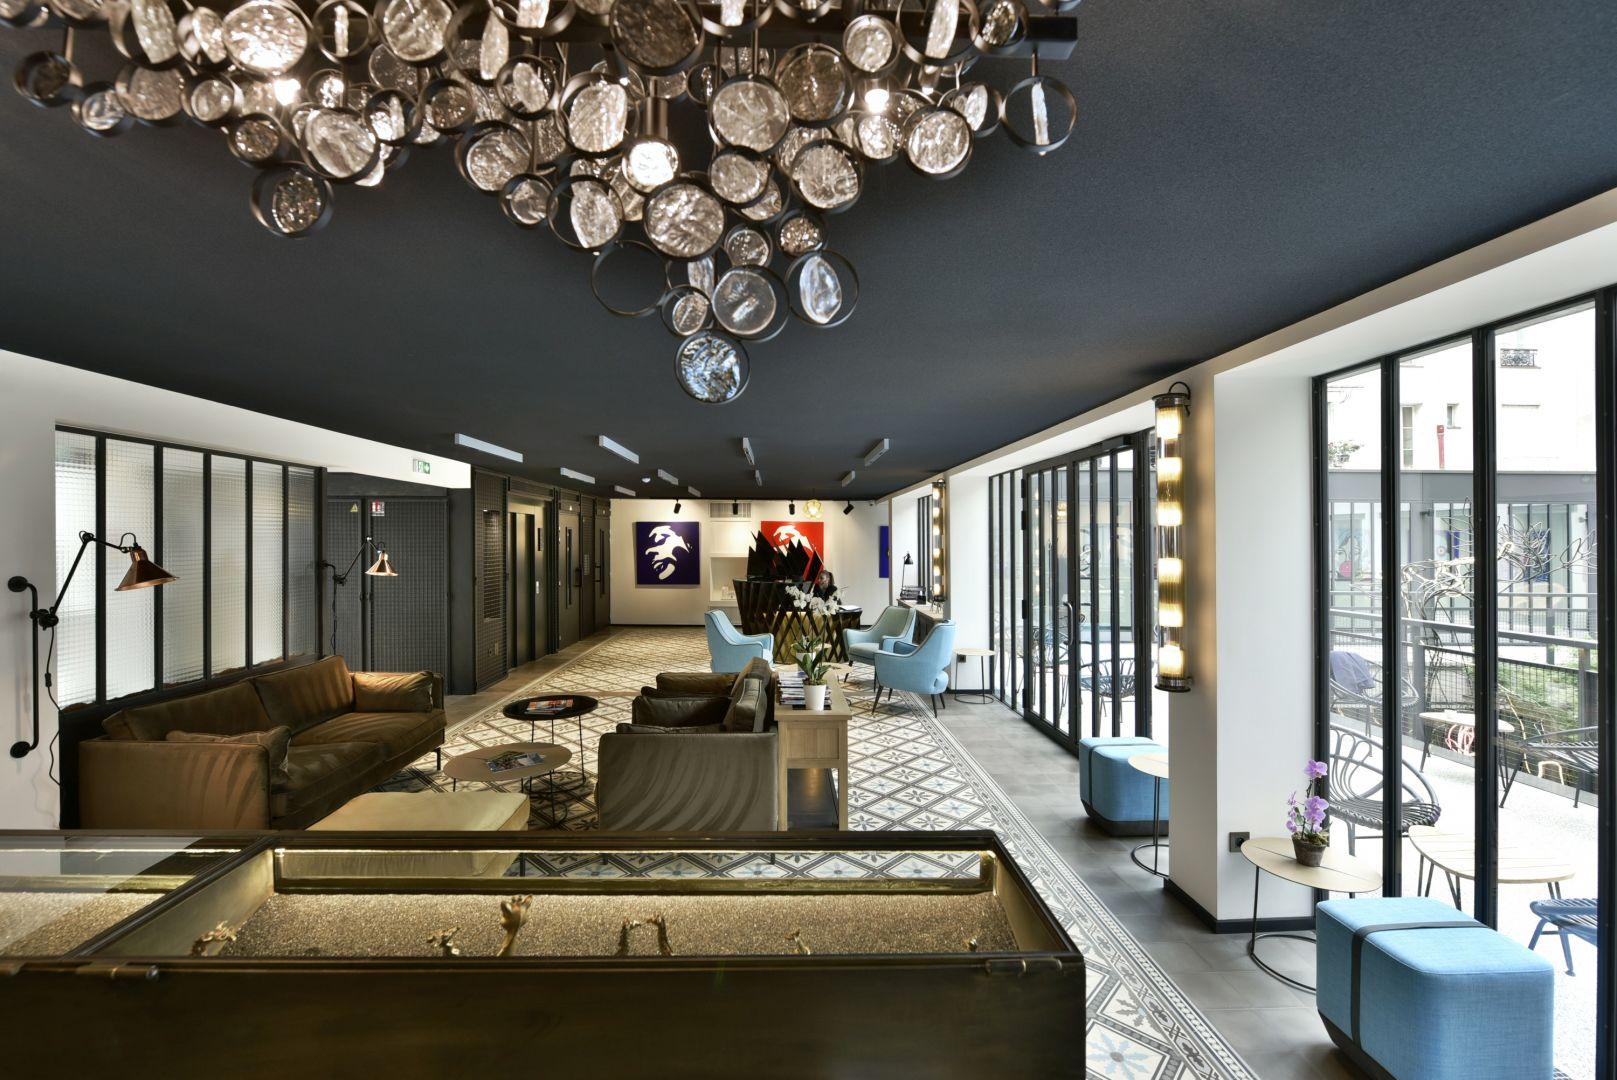 Hotel des deux Girafes i restauracja Bellay, Paryż